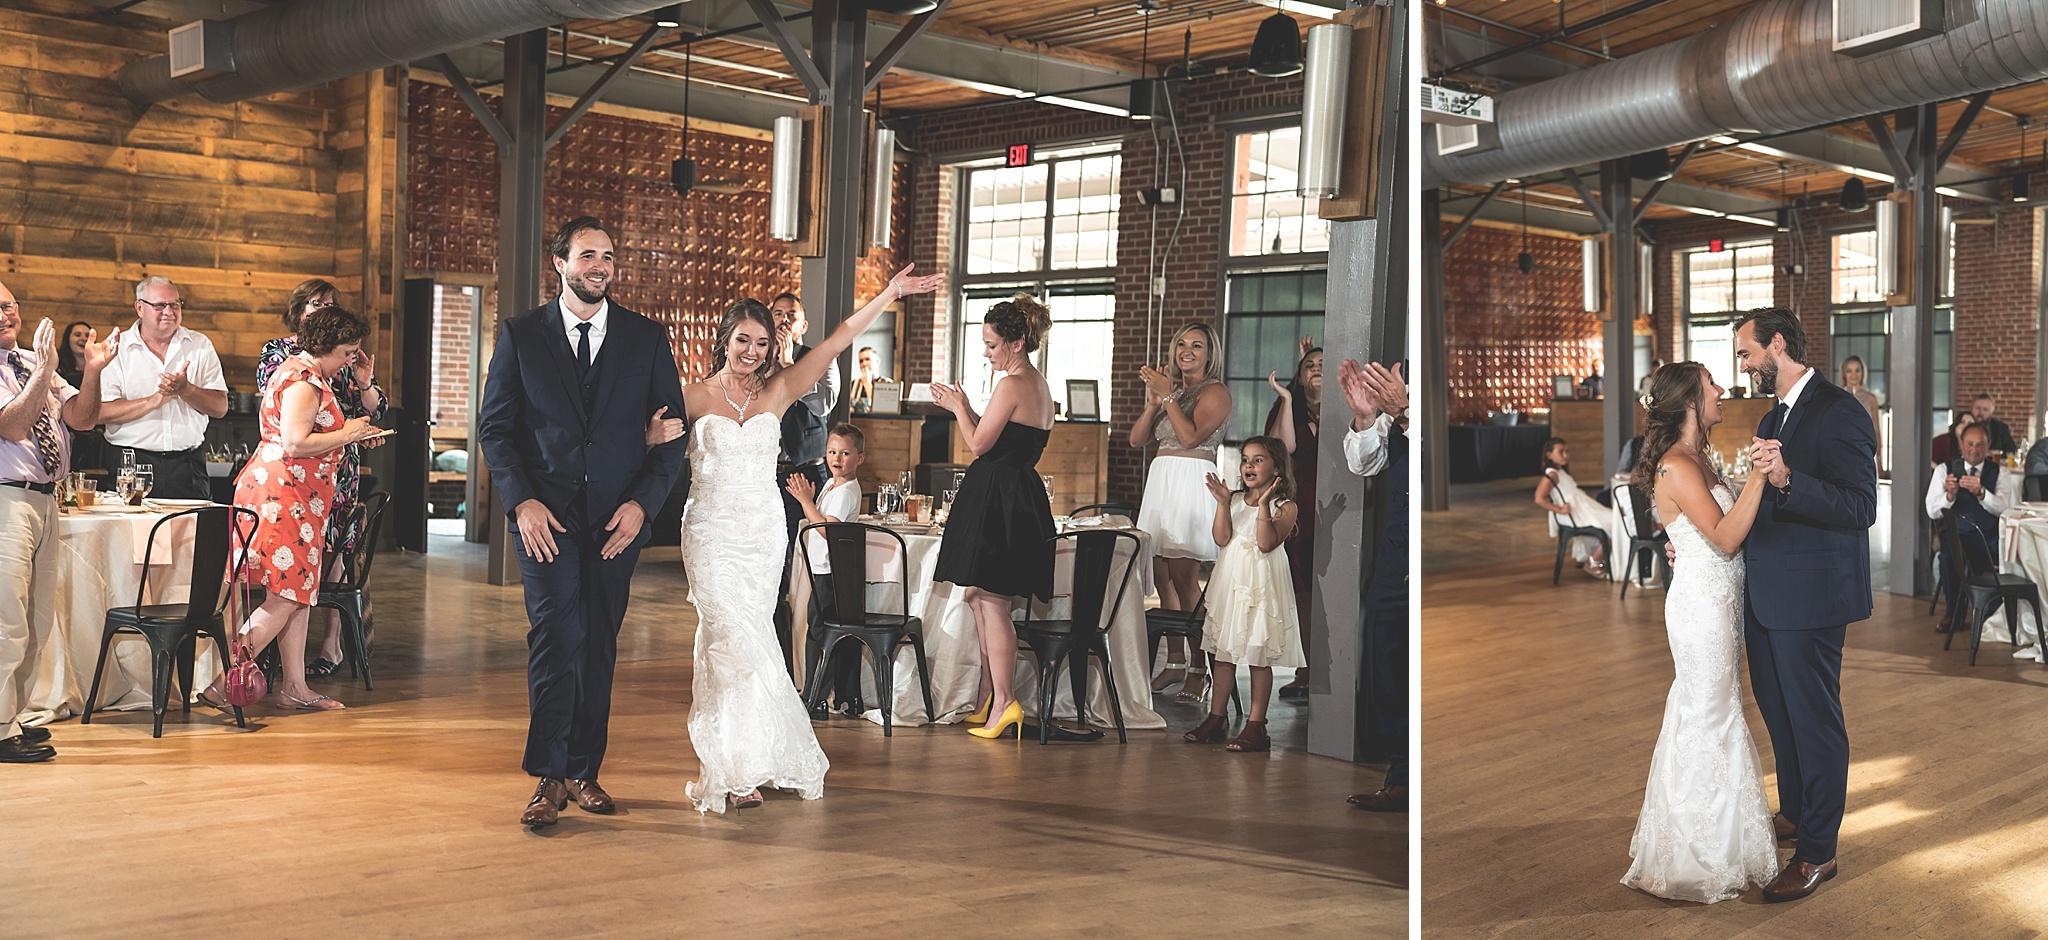 Rickhouse-Durham-NC-Wedding-Photographer-060.jpg